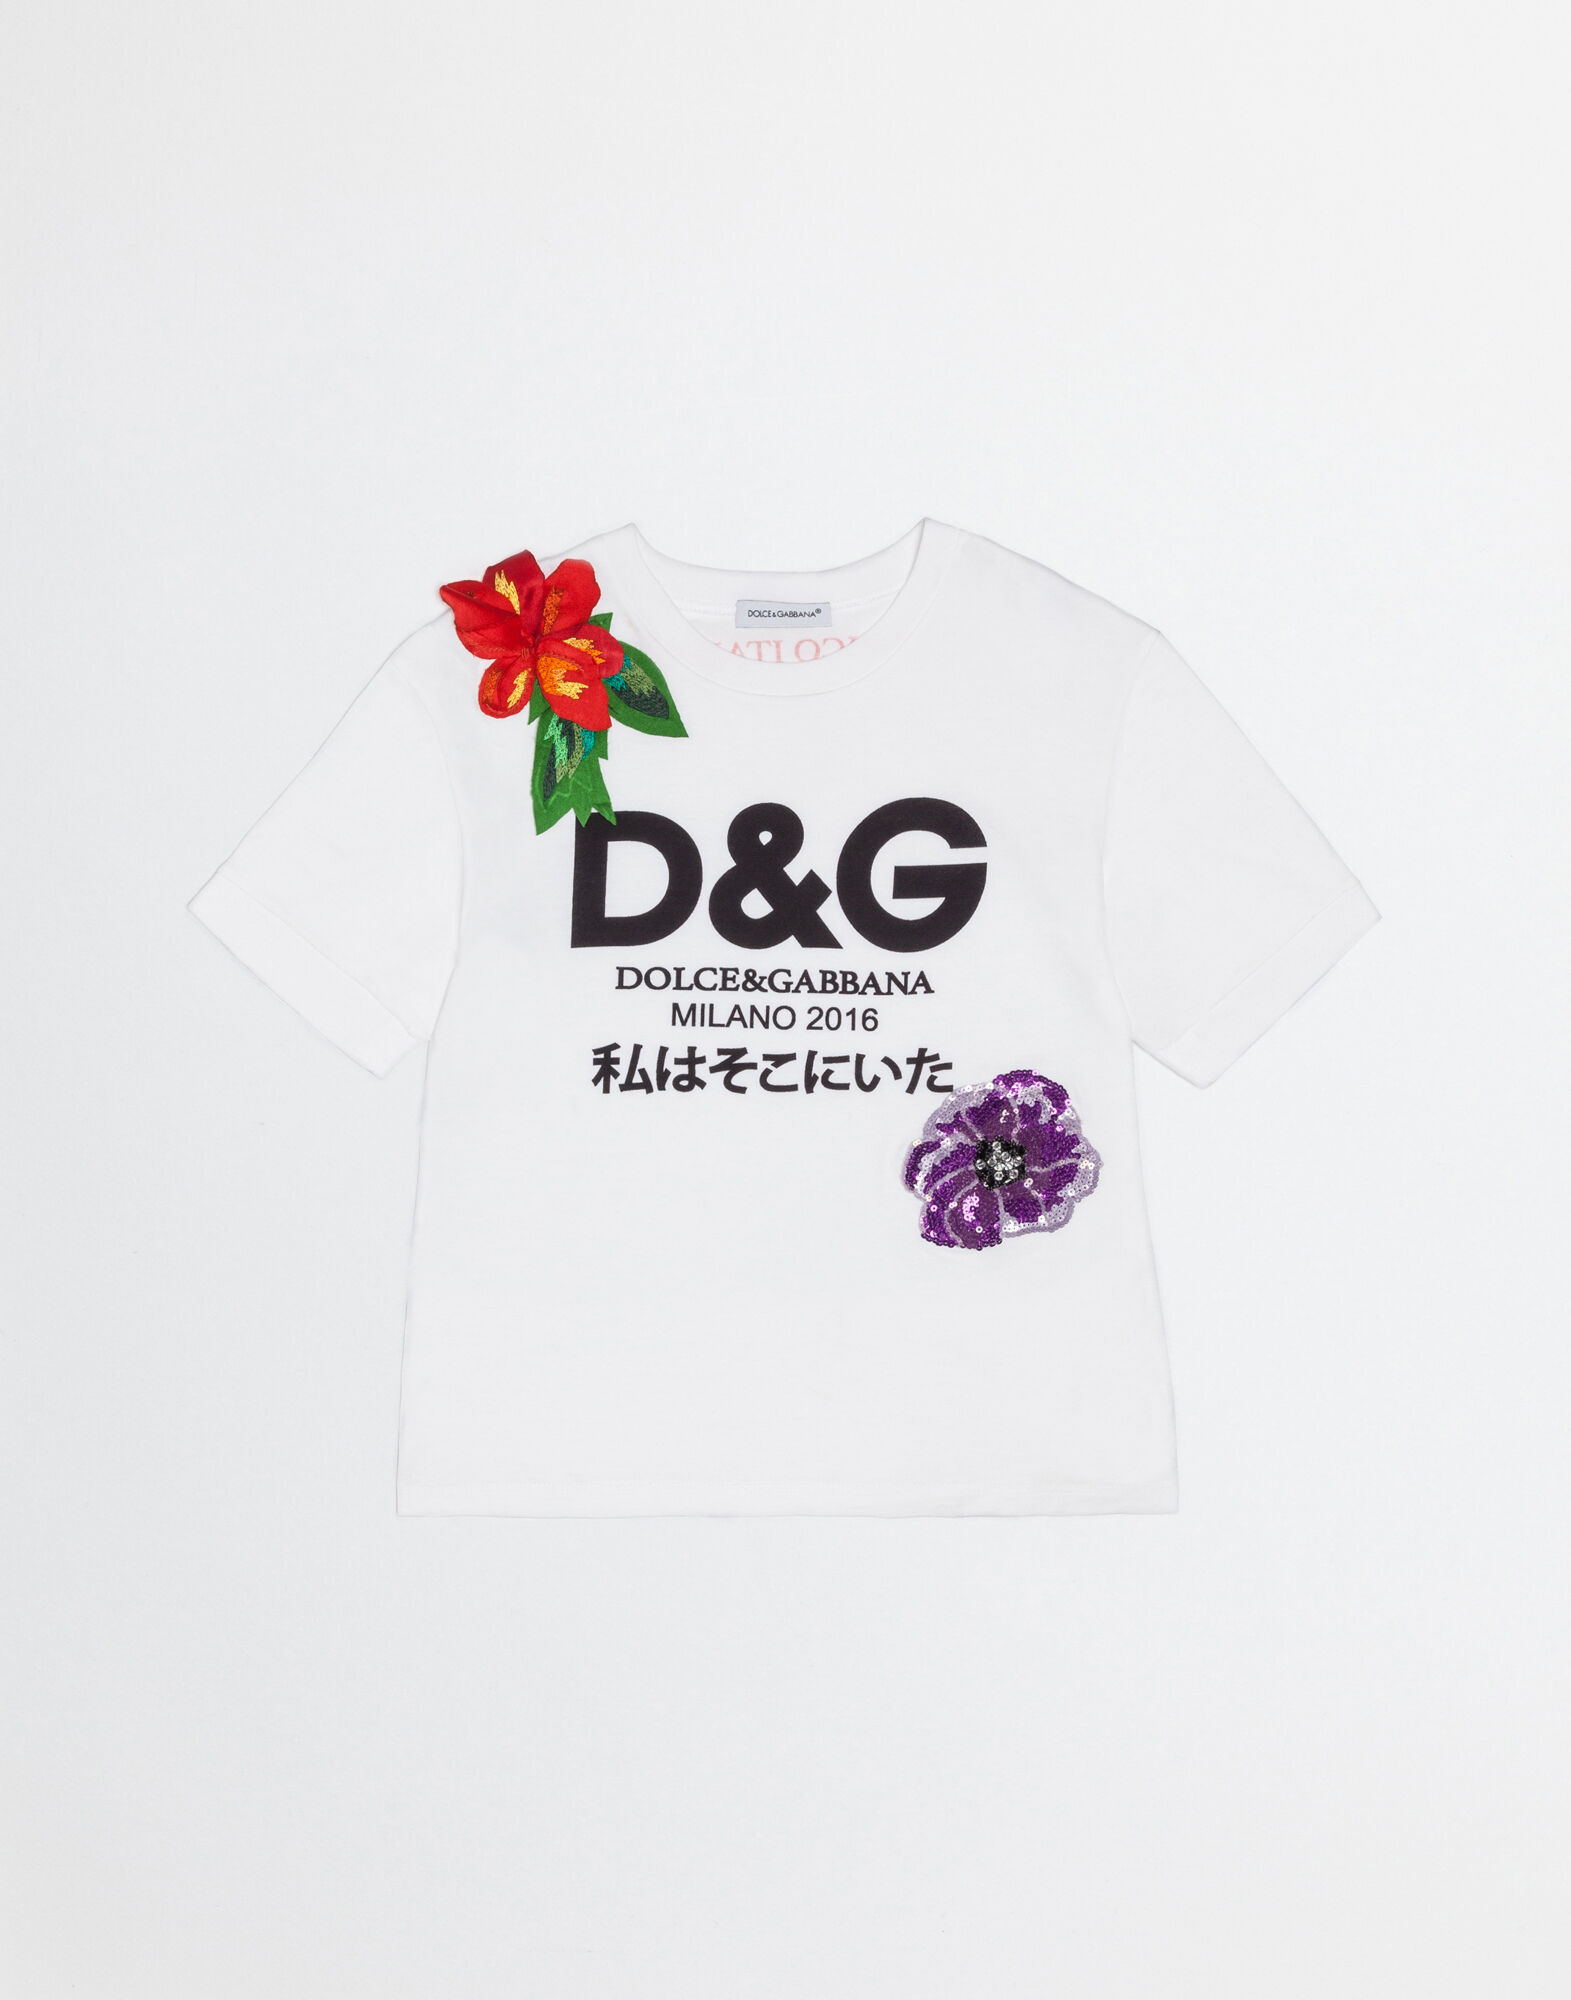 T shirt japanese design -  T Shirt With Io C Ero Print In Japanese